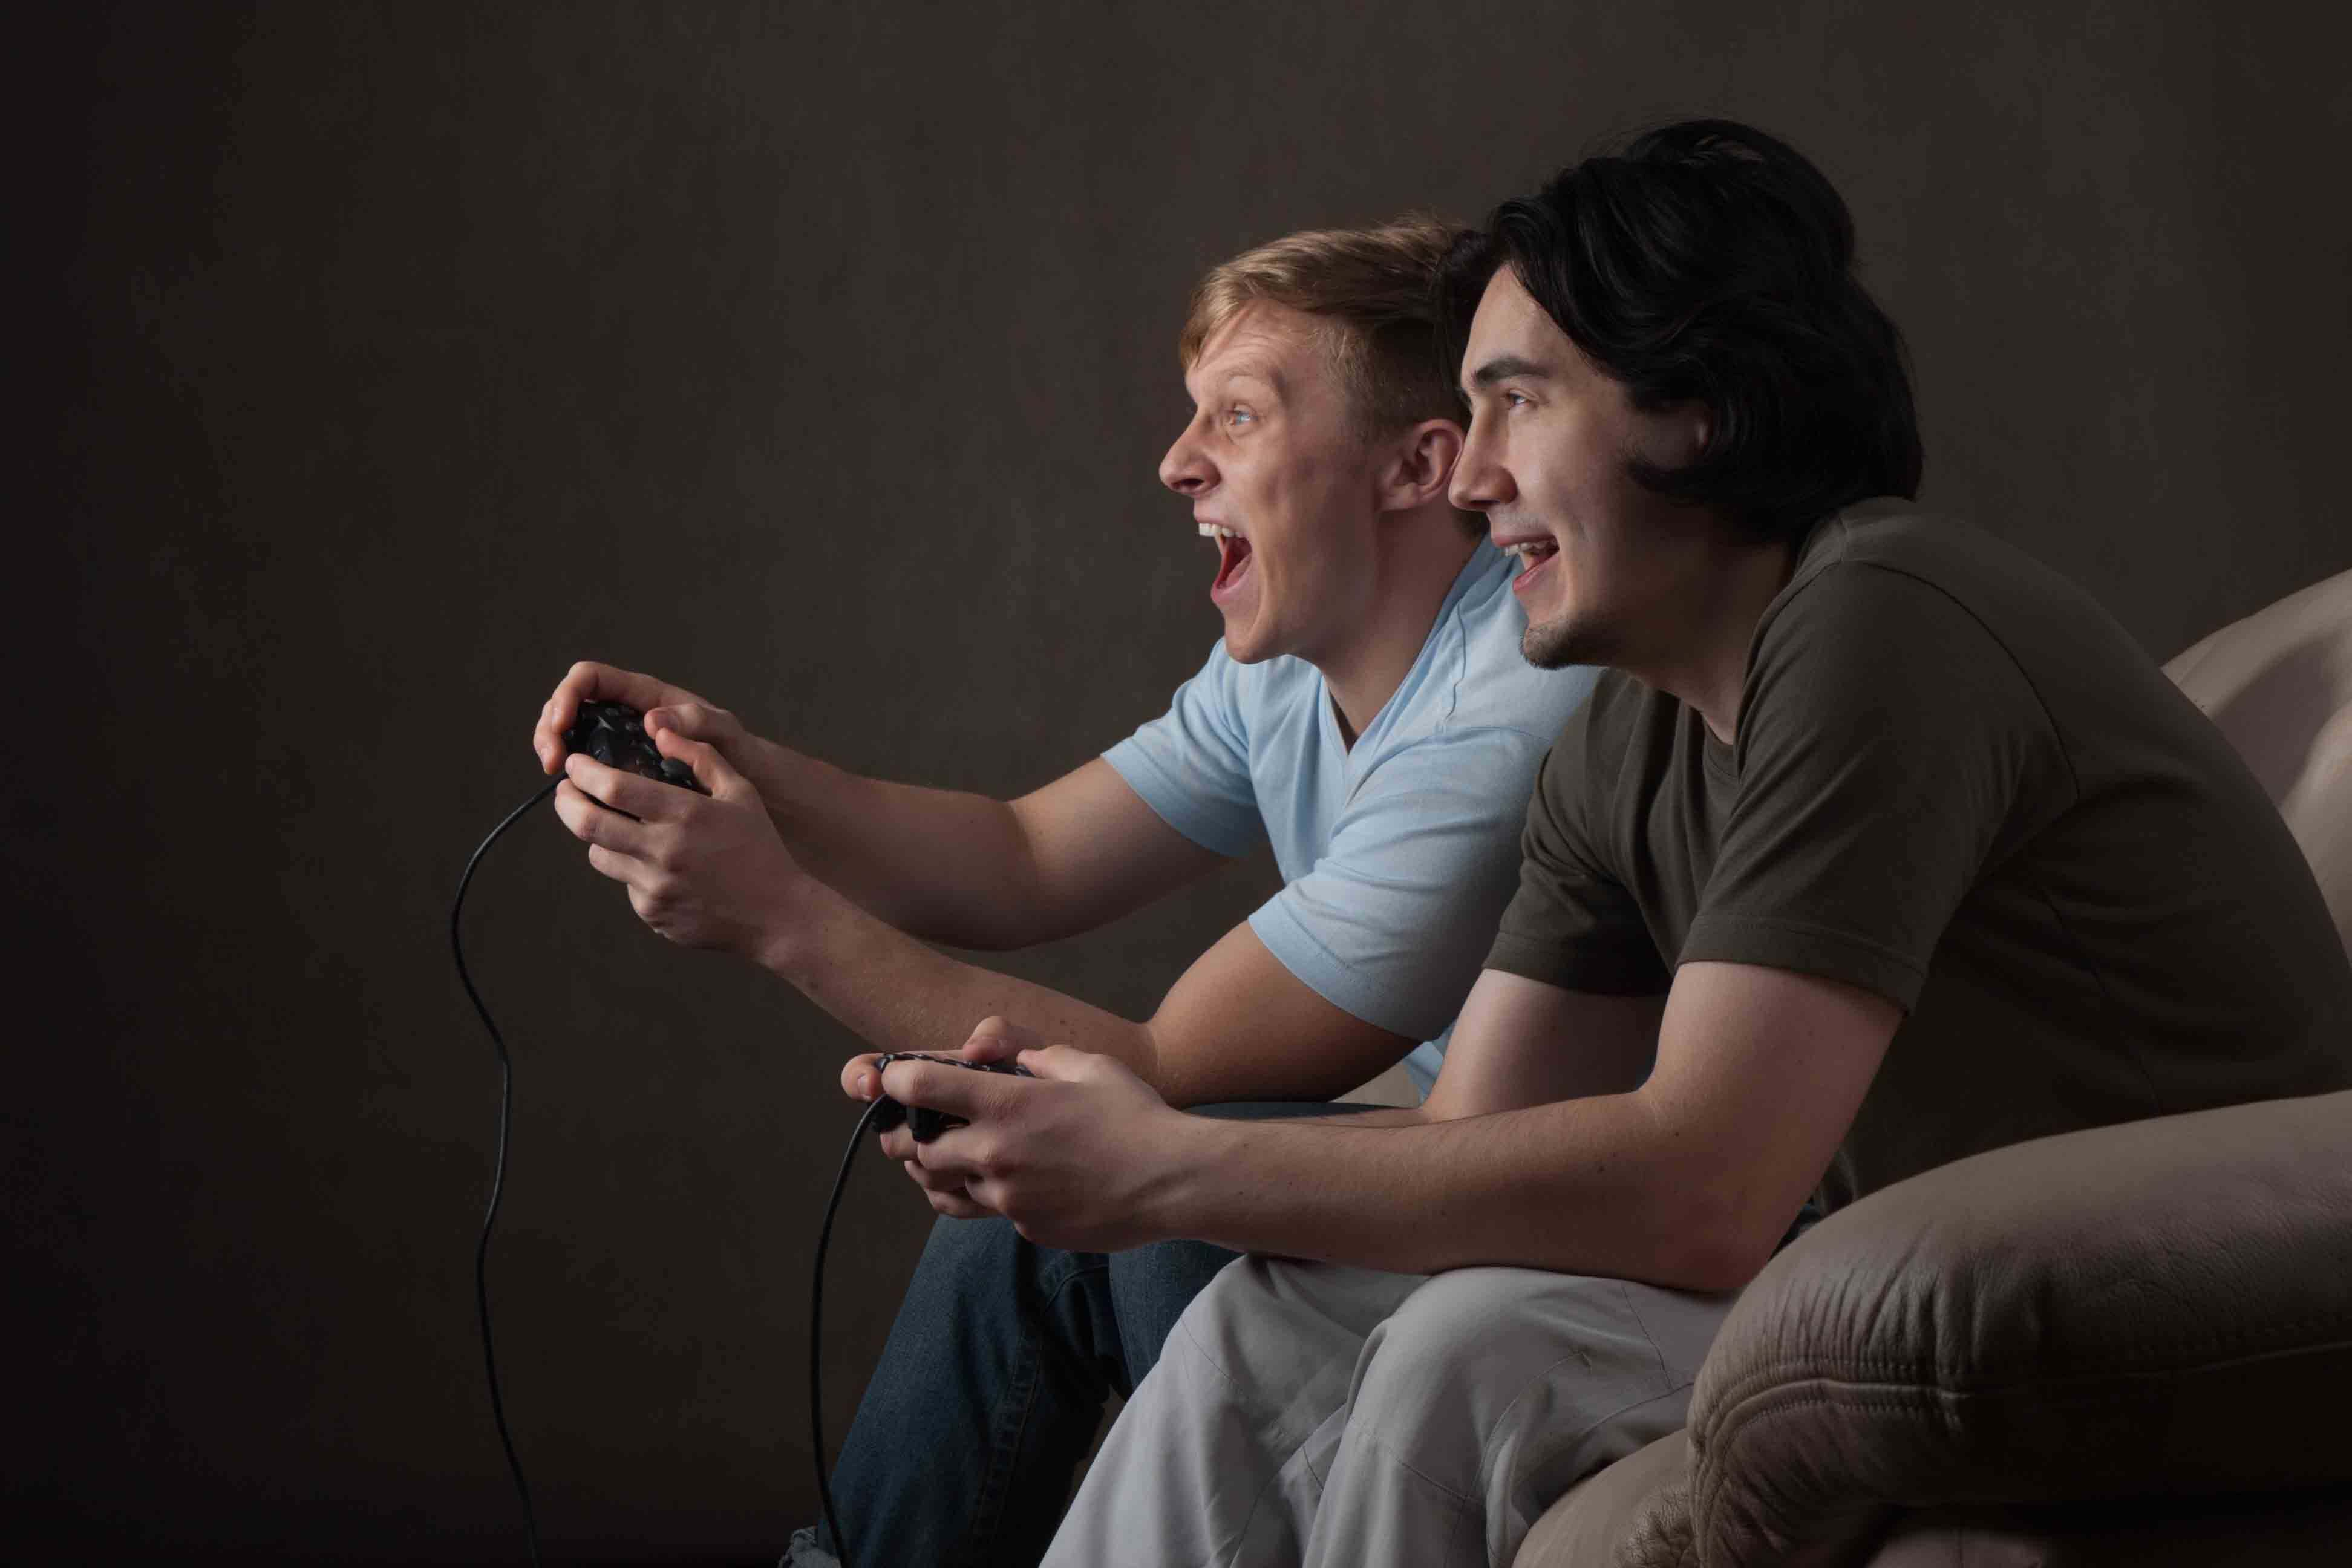 joy family friendly gaming - HD3888×2592